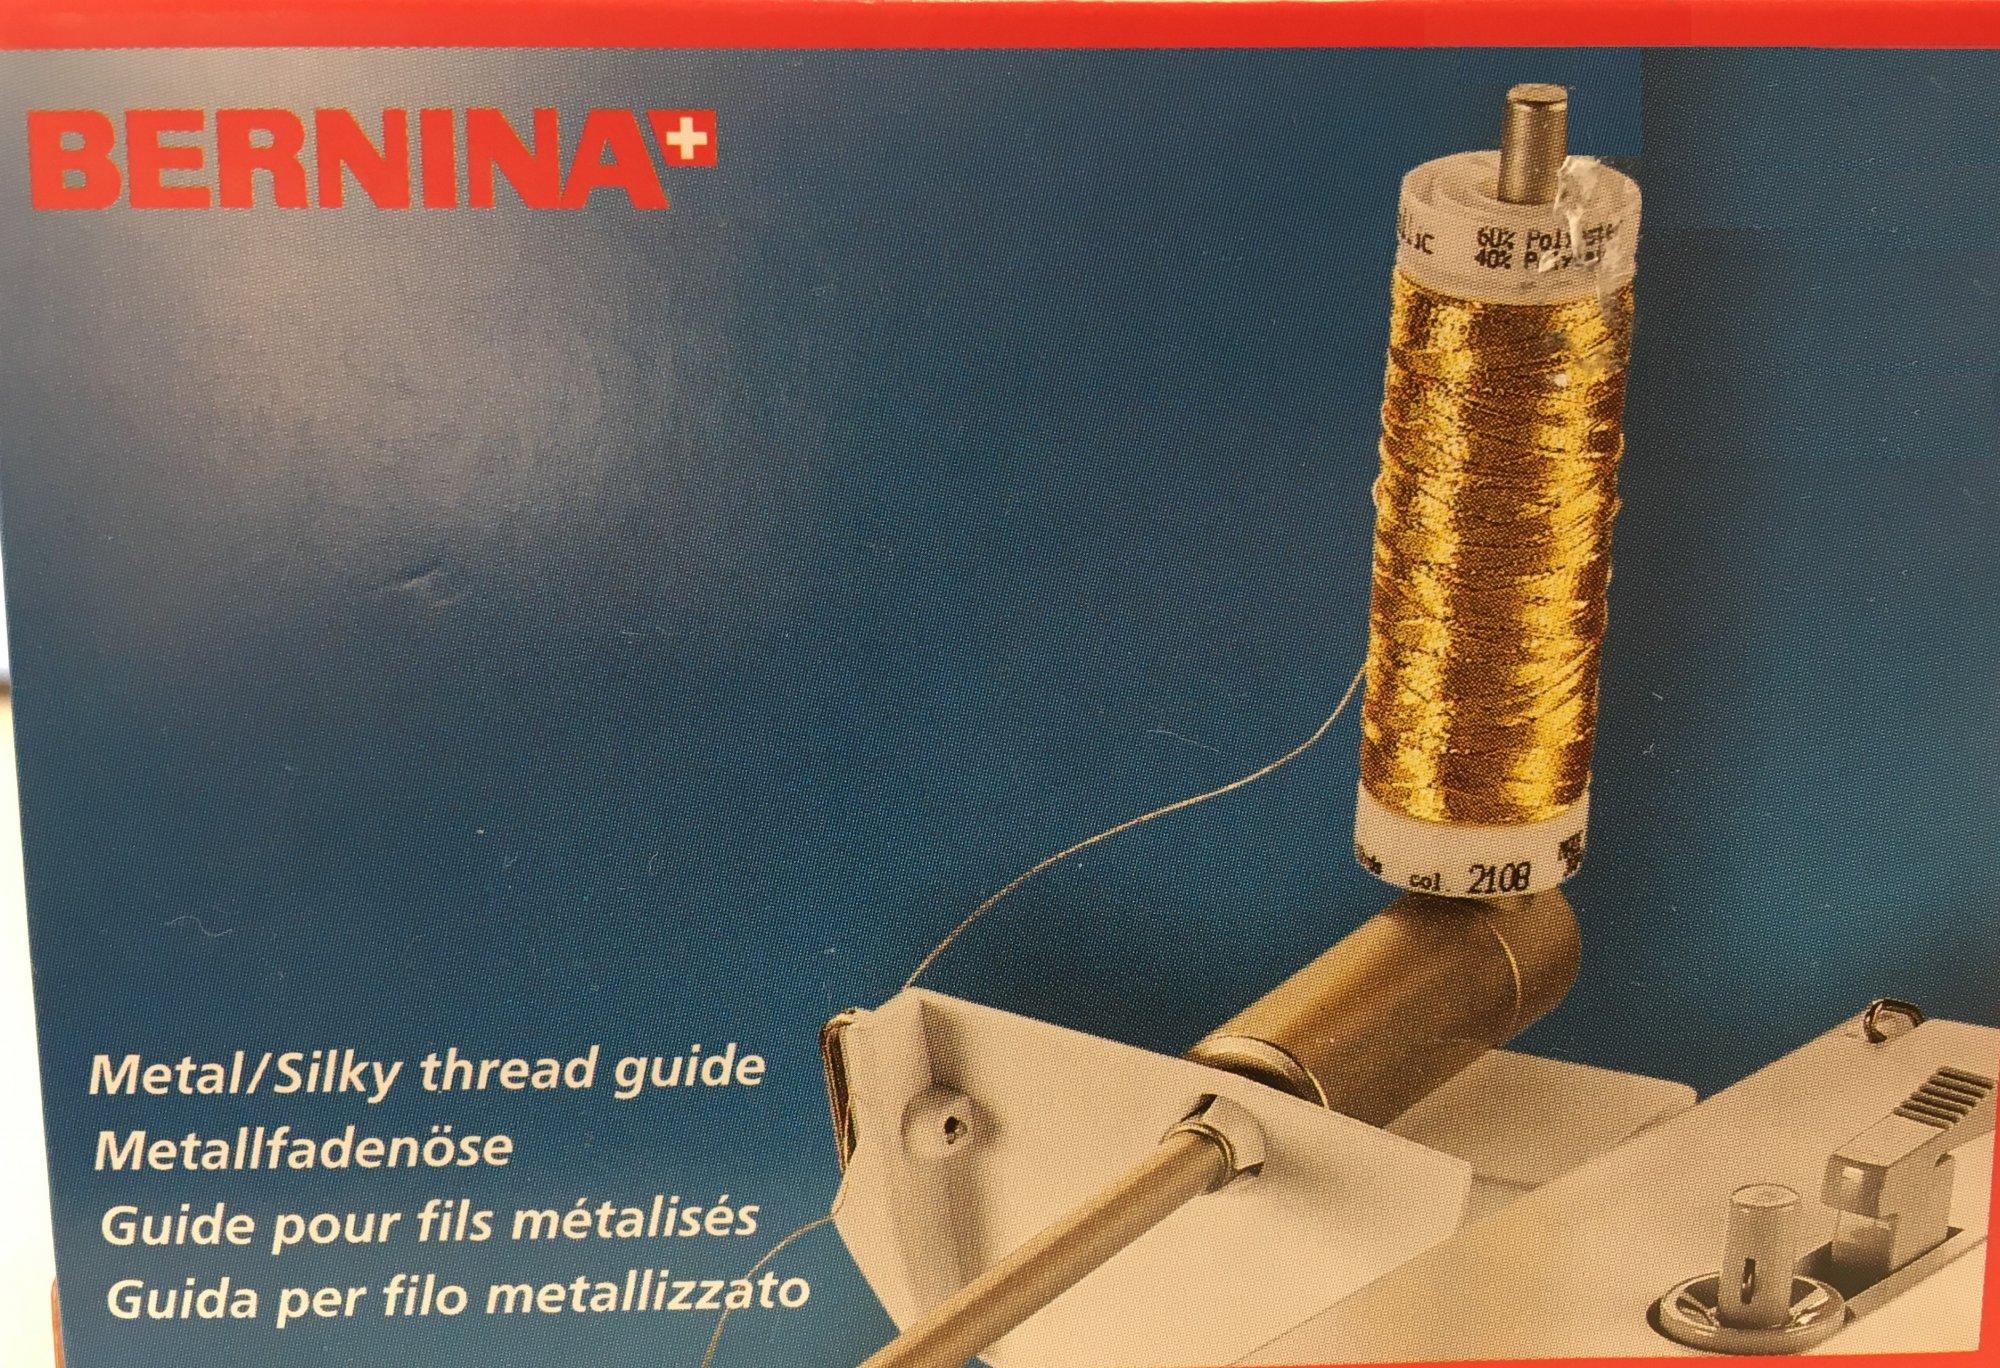 Bernina - #89 Supplementary Thread Guide (Silky/Metallic)